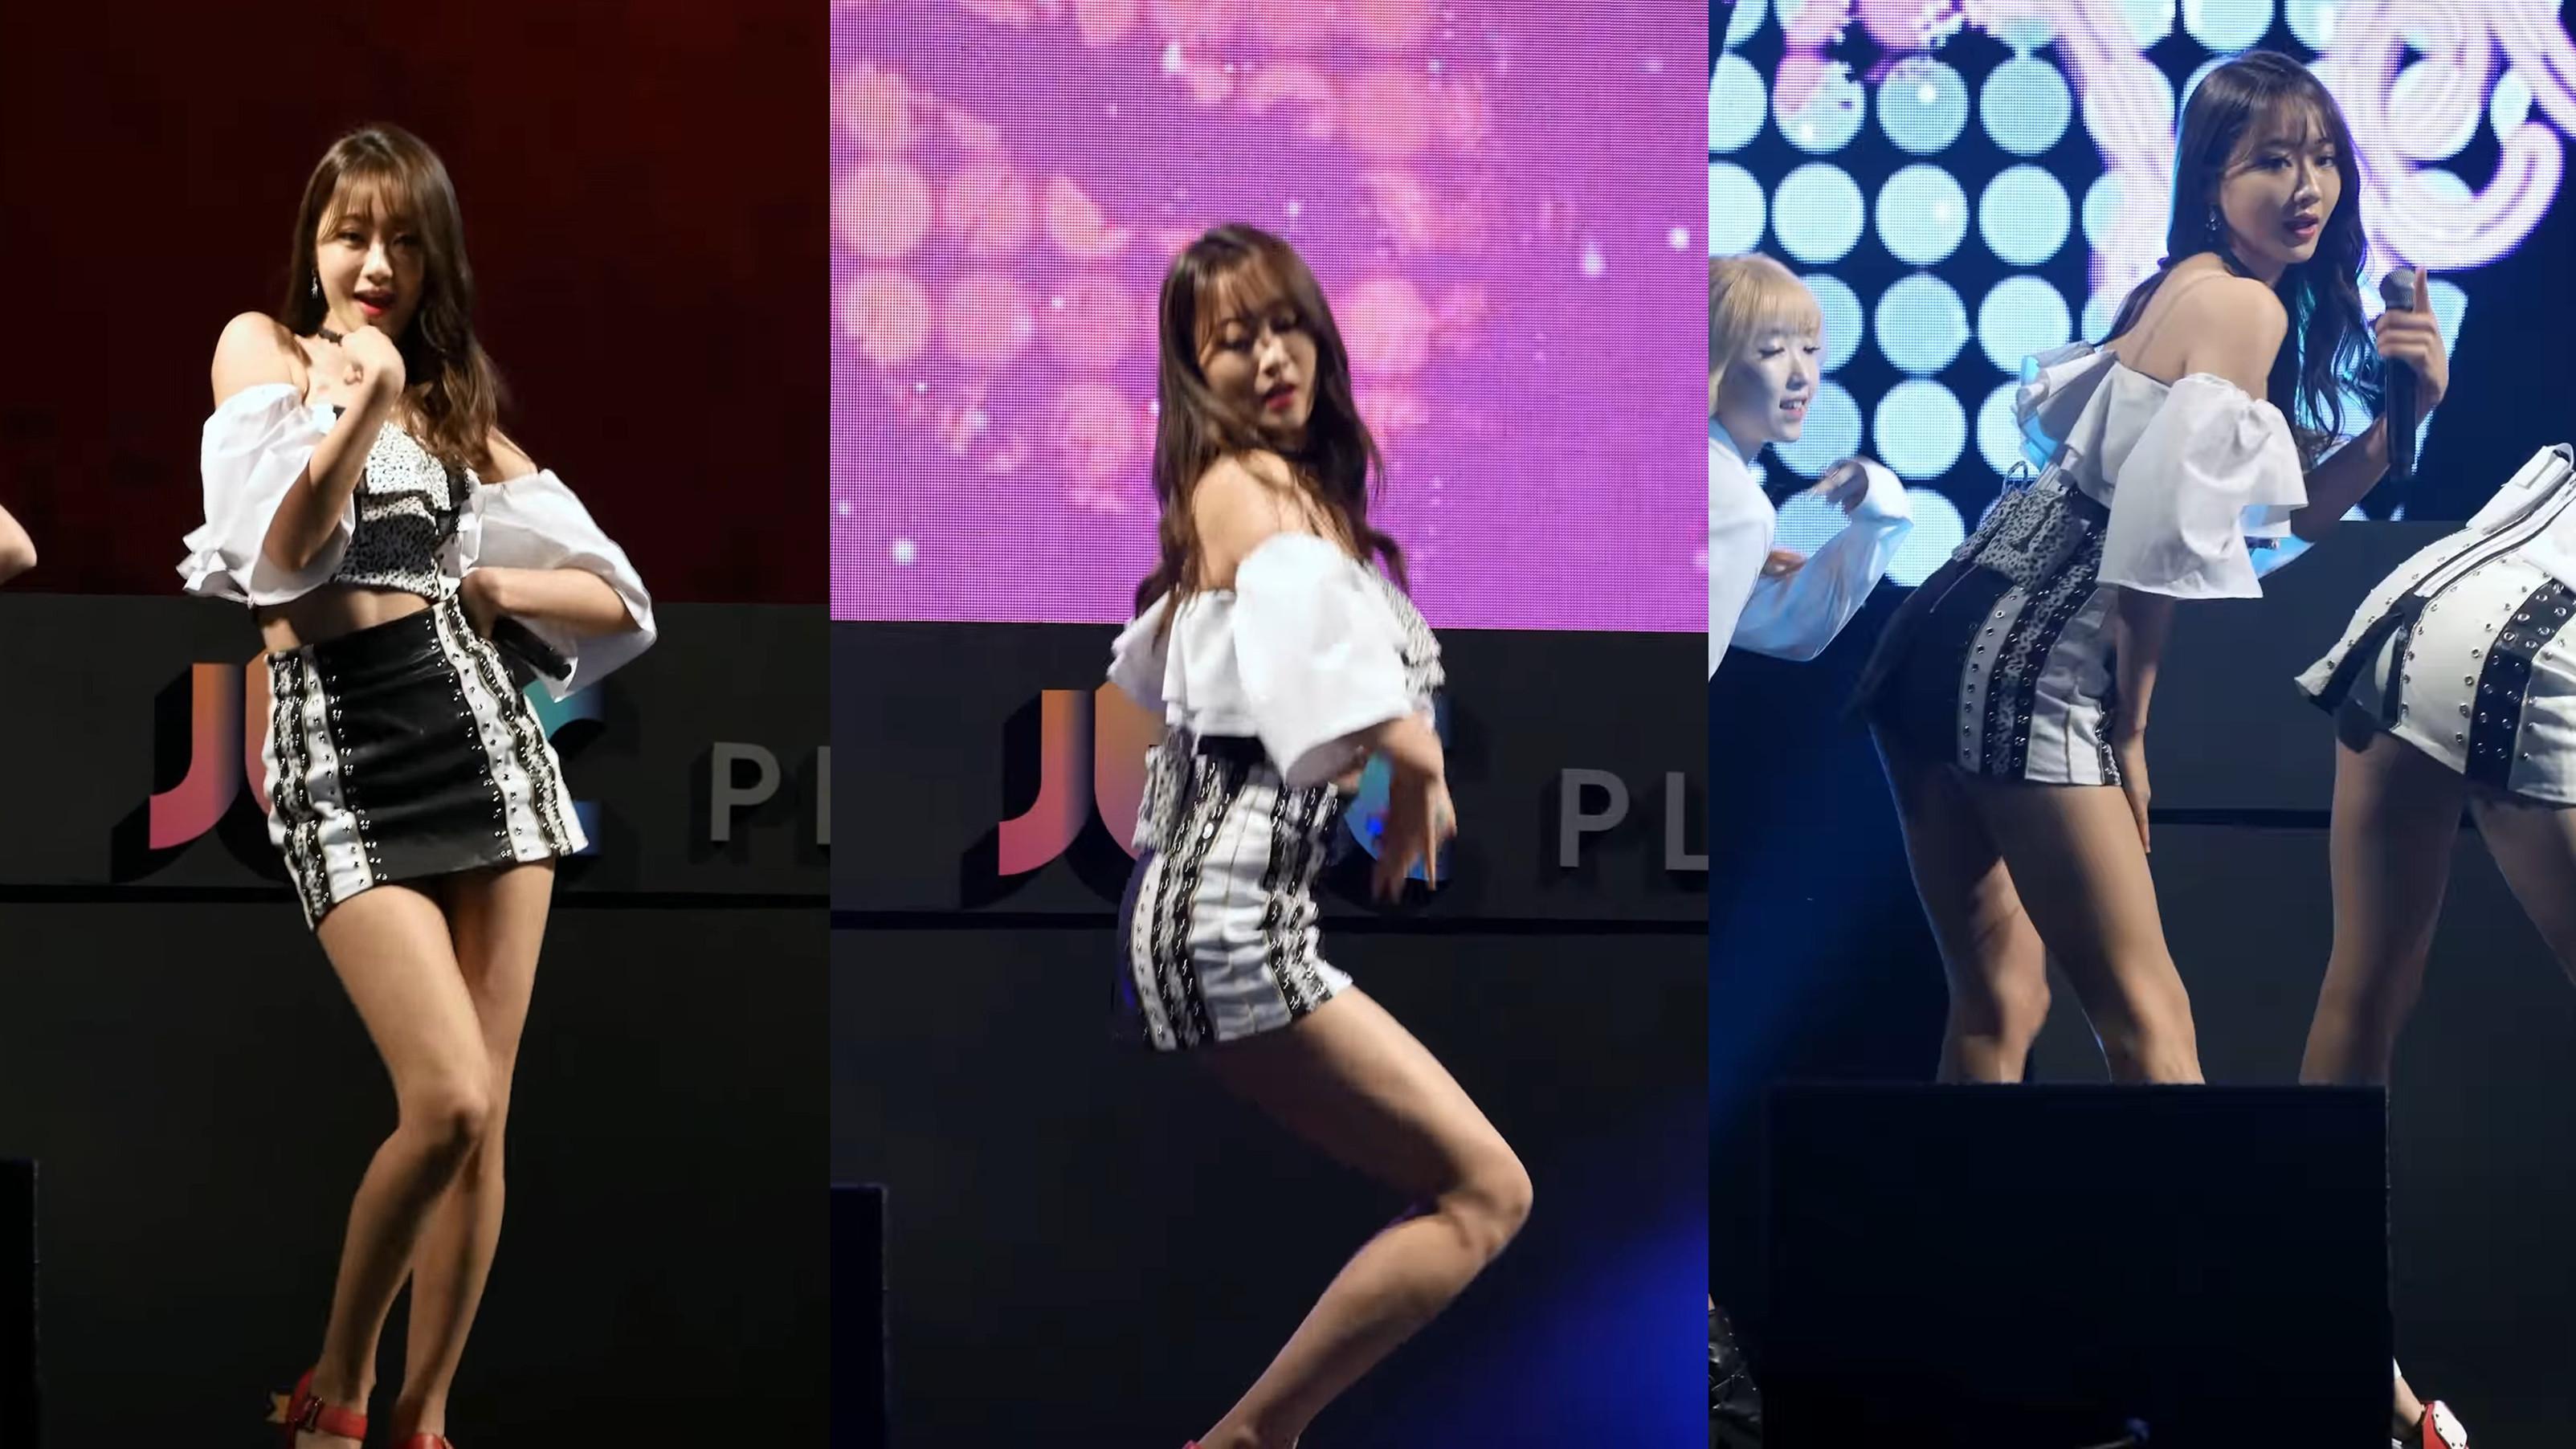 [2016年] 韩国女团Nine Muses(9muses) 饭拍视频11部合辑[1.31G]